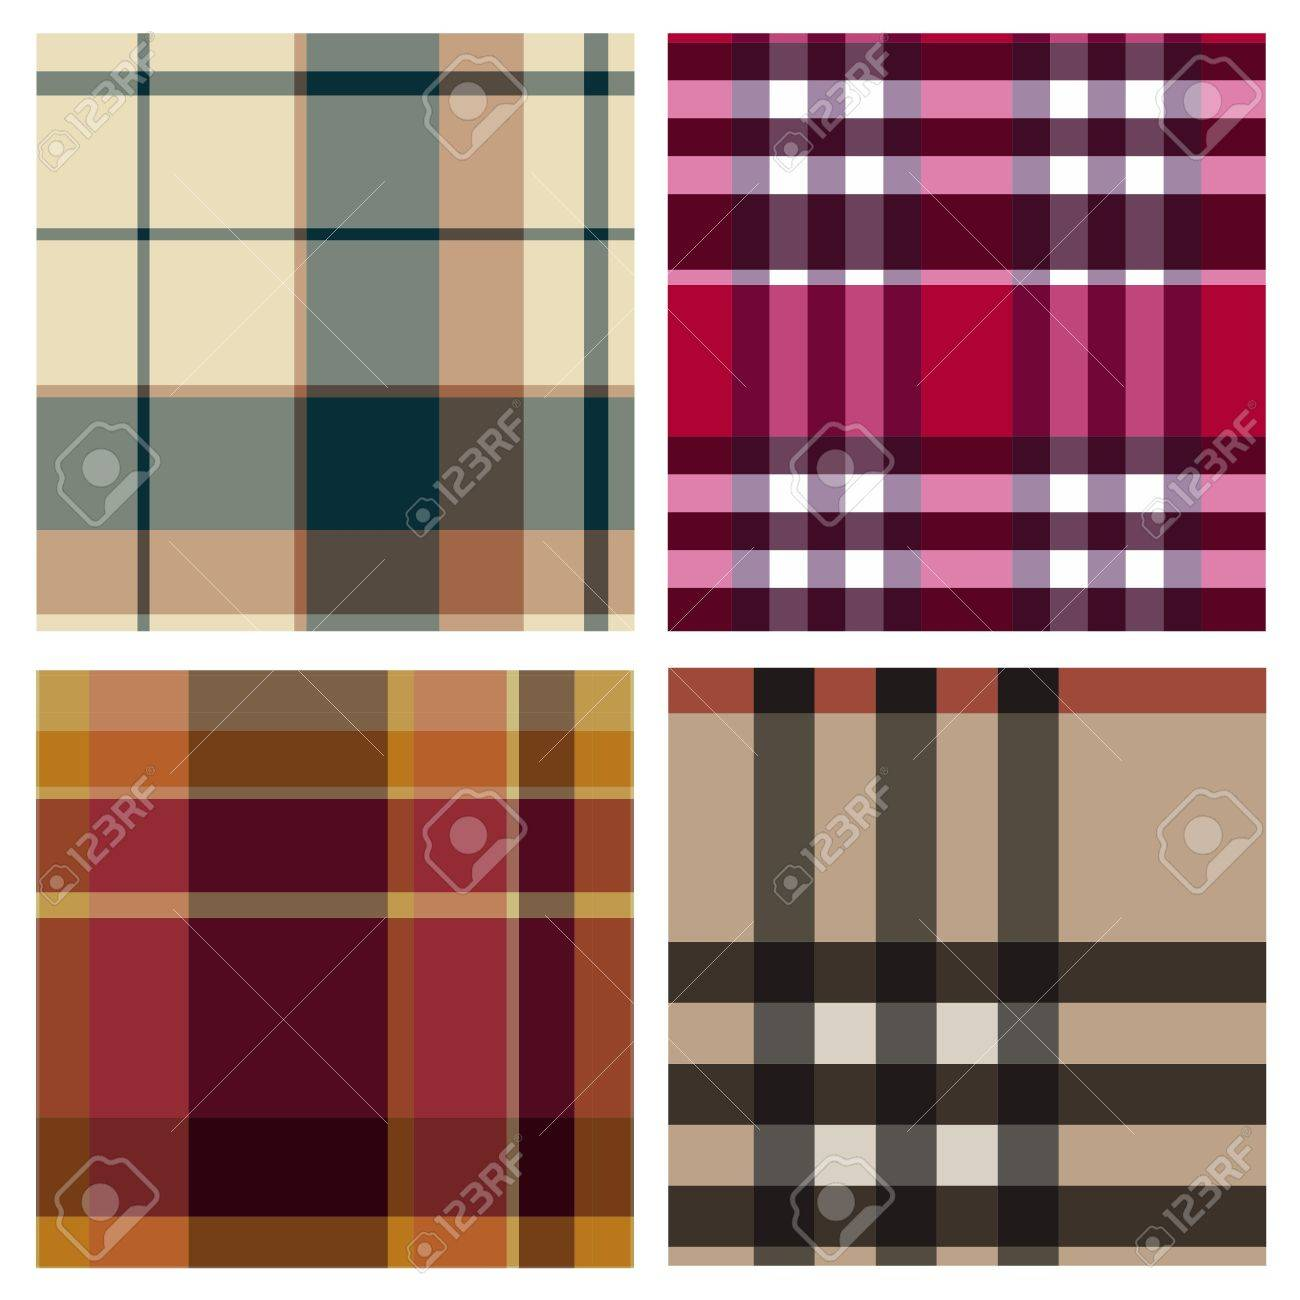 Tartan plaid fabric textile patterns Stock Vector - 13768743